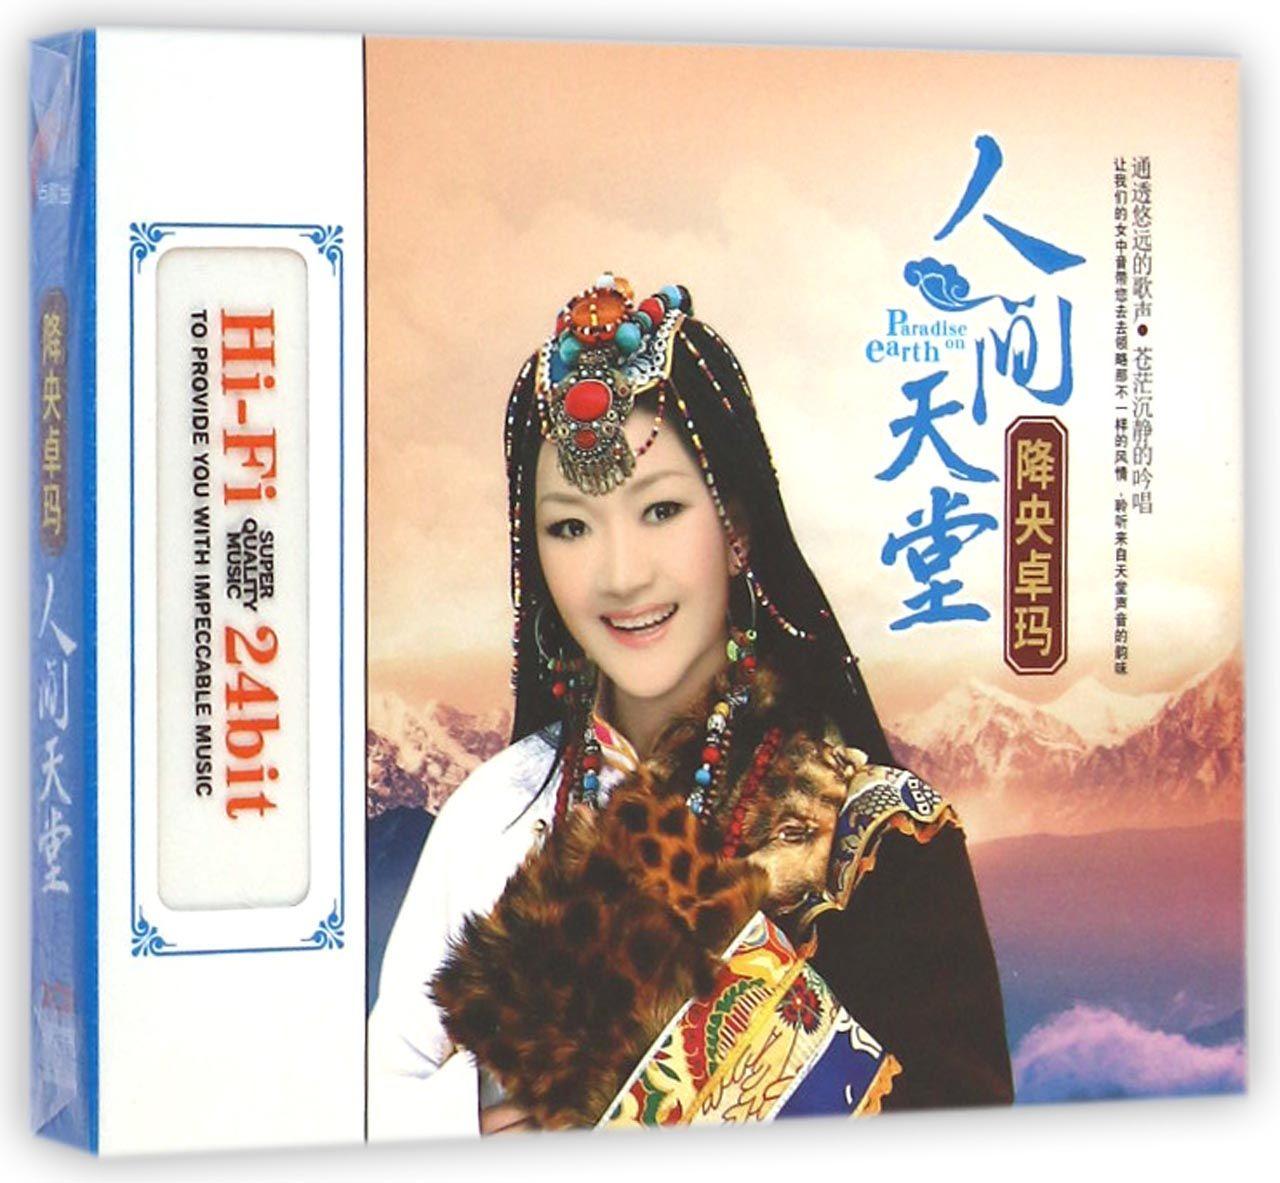 cd-hd降央卓玛人间天堂(3碟装)